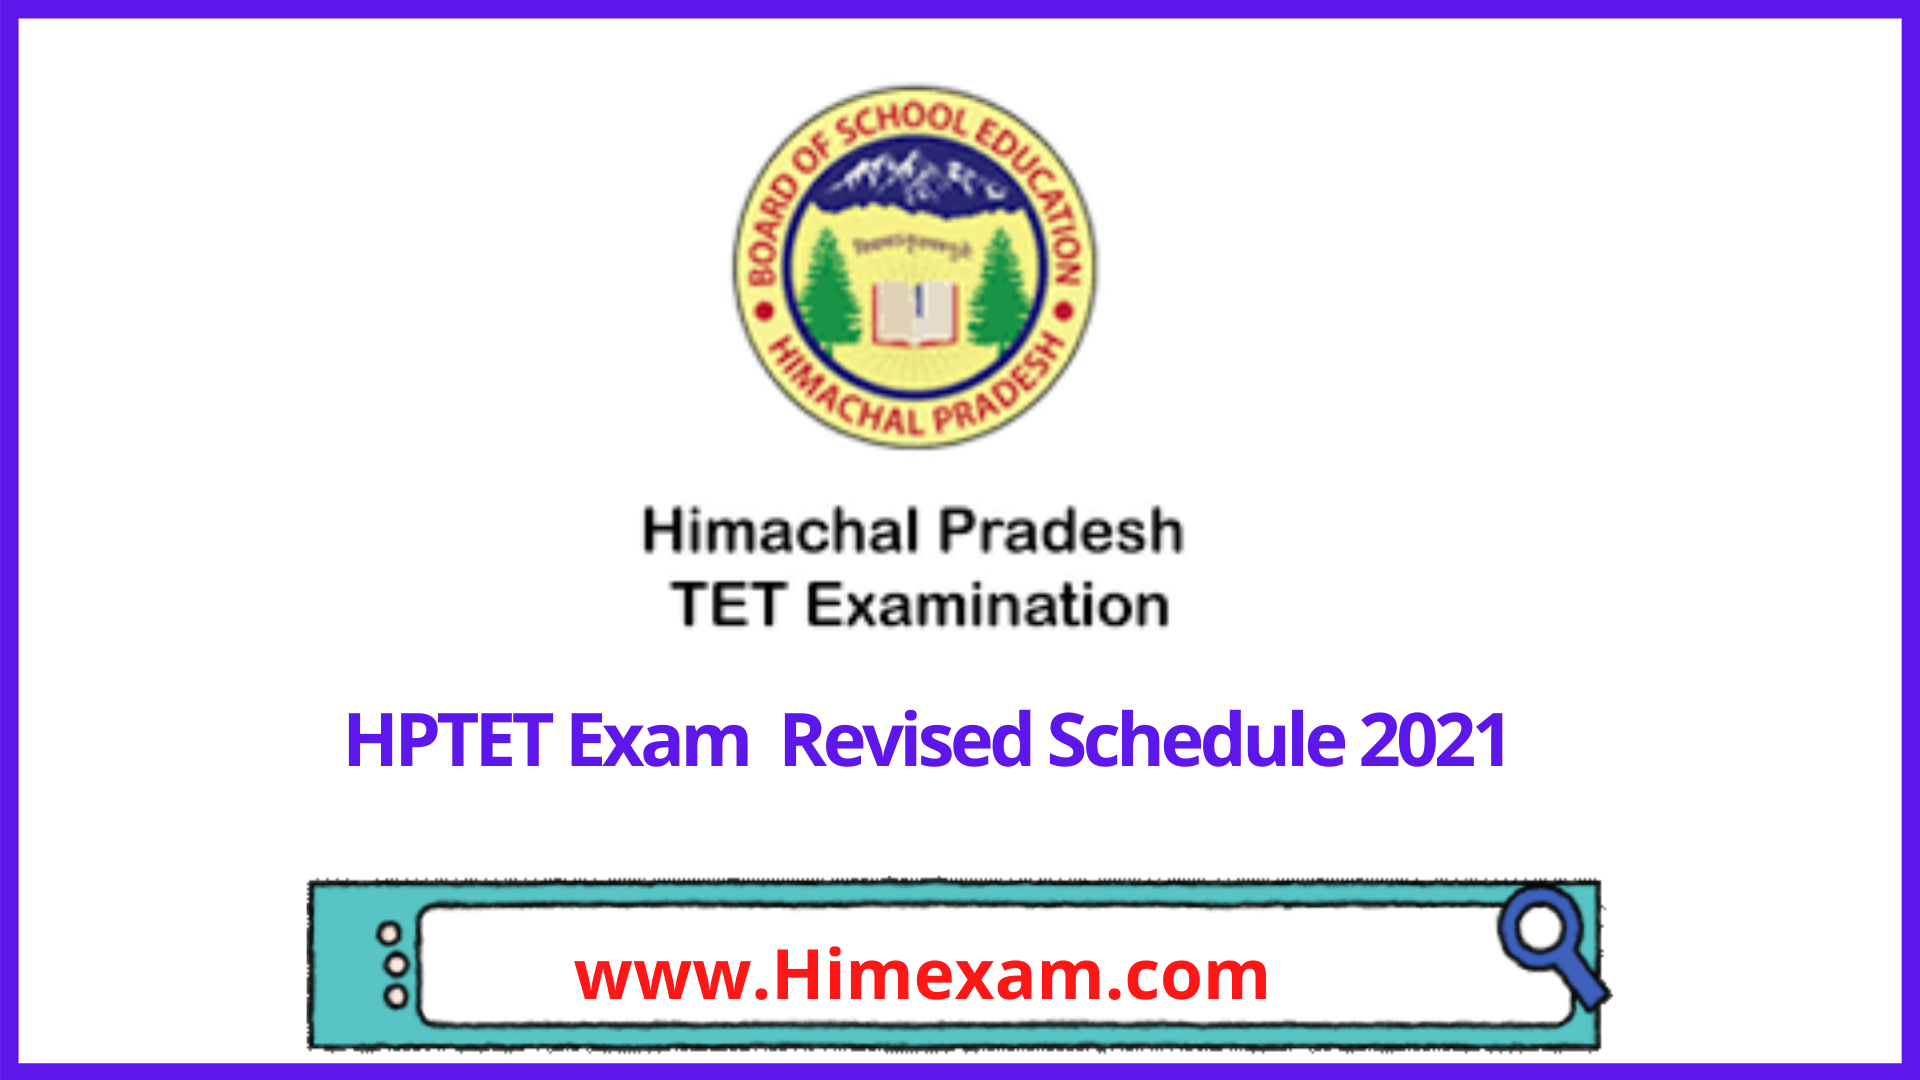 HPTET Revised Schedule 2021